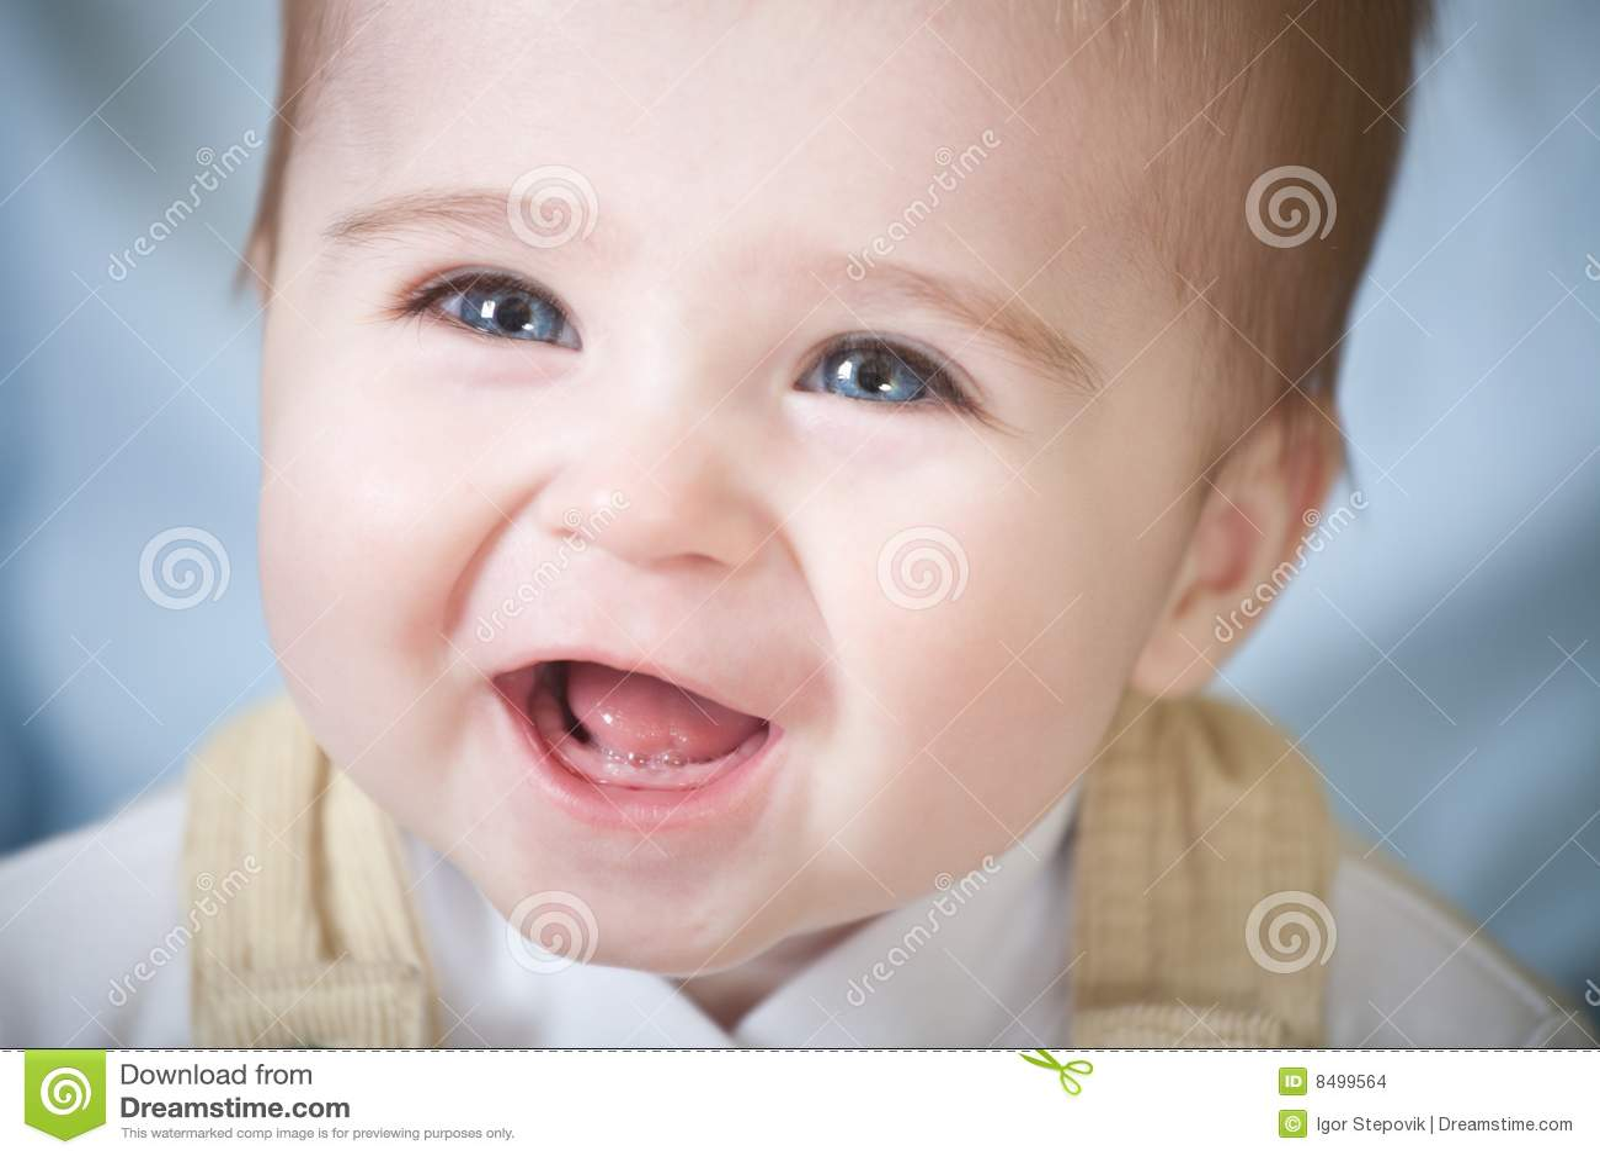 portrait of happy blueeyes baby stock images image 8499564